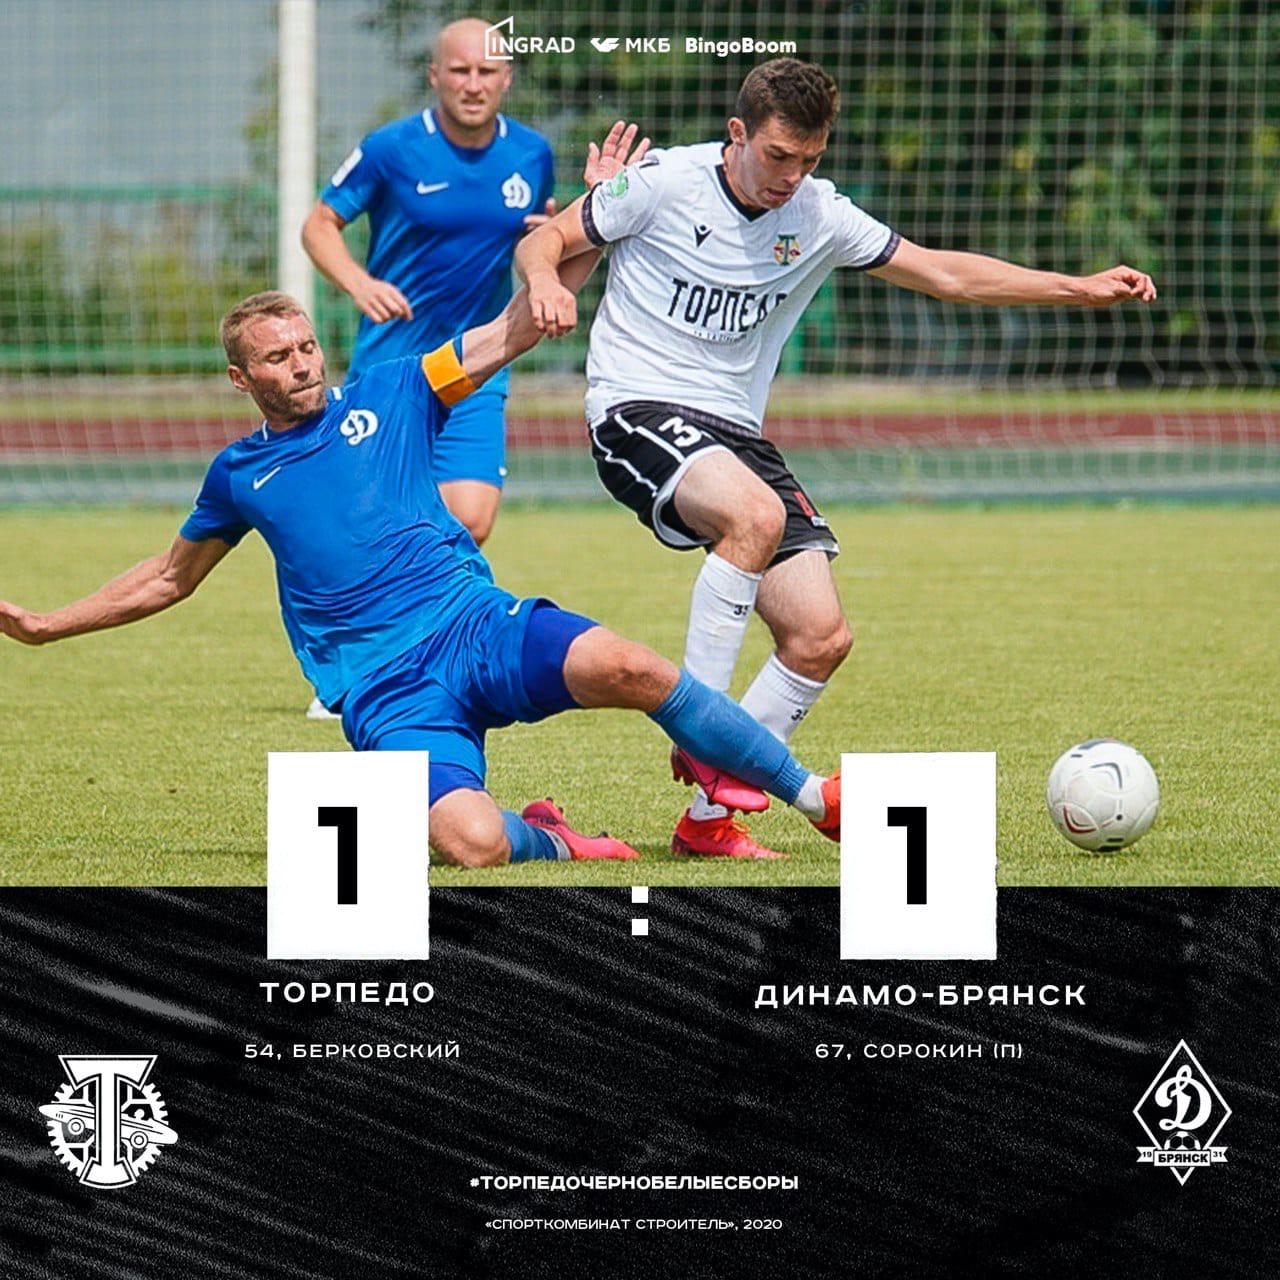 Торпедо (Москва) - Динамо (Брянск) 1:1